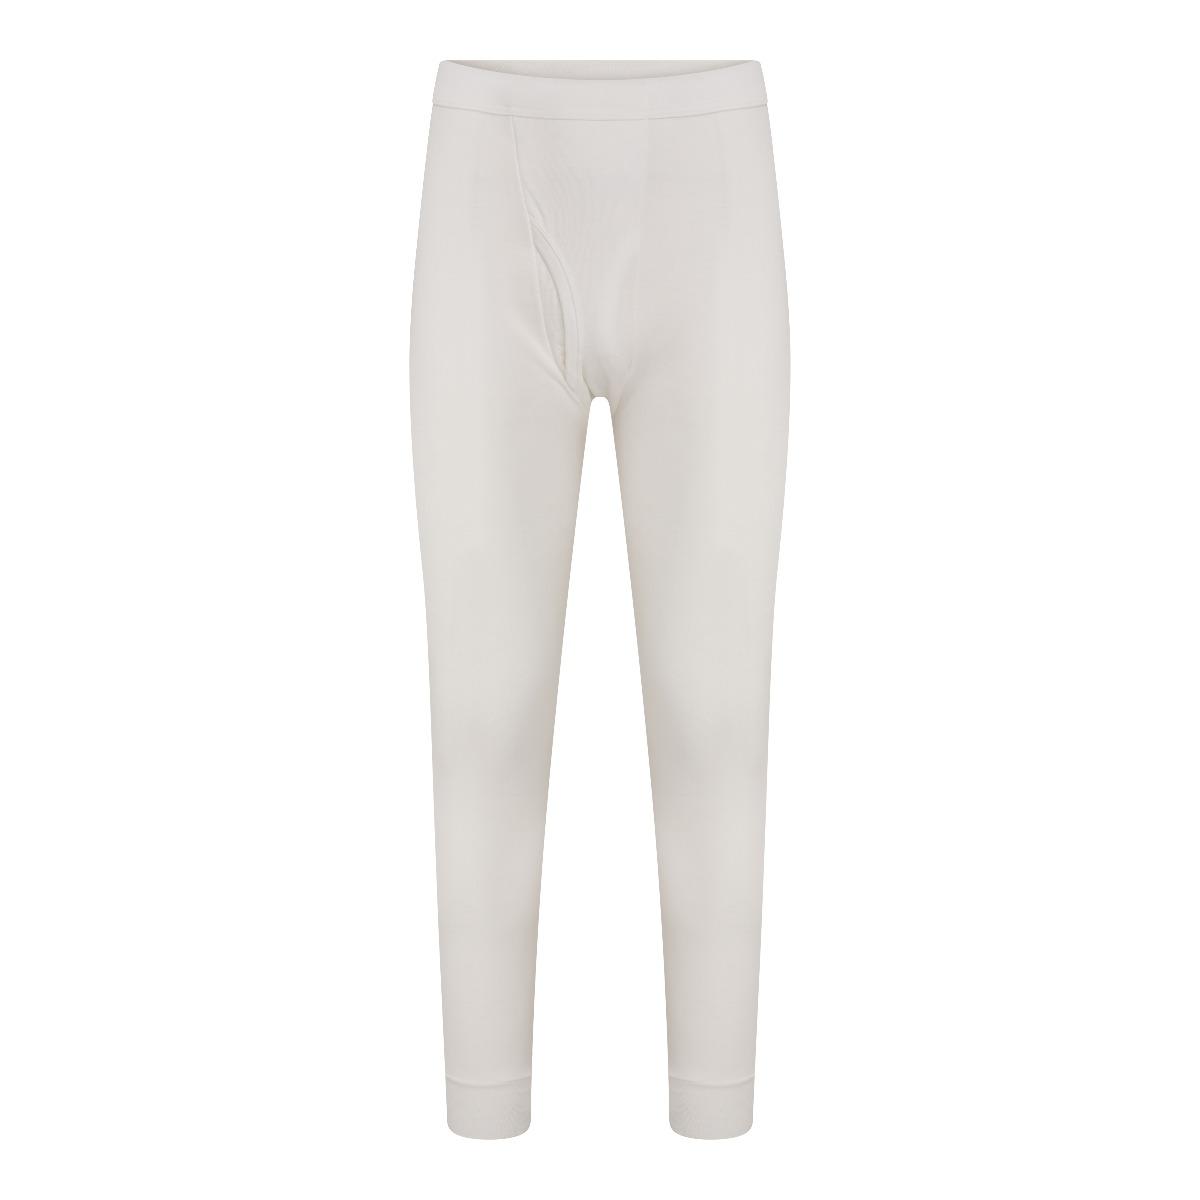 Beeren Thermo Heren Pantalon Wolwit L